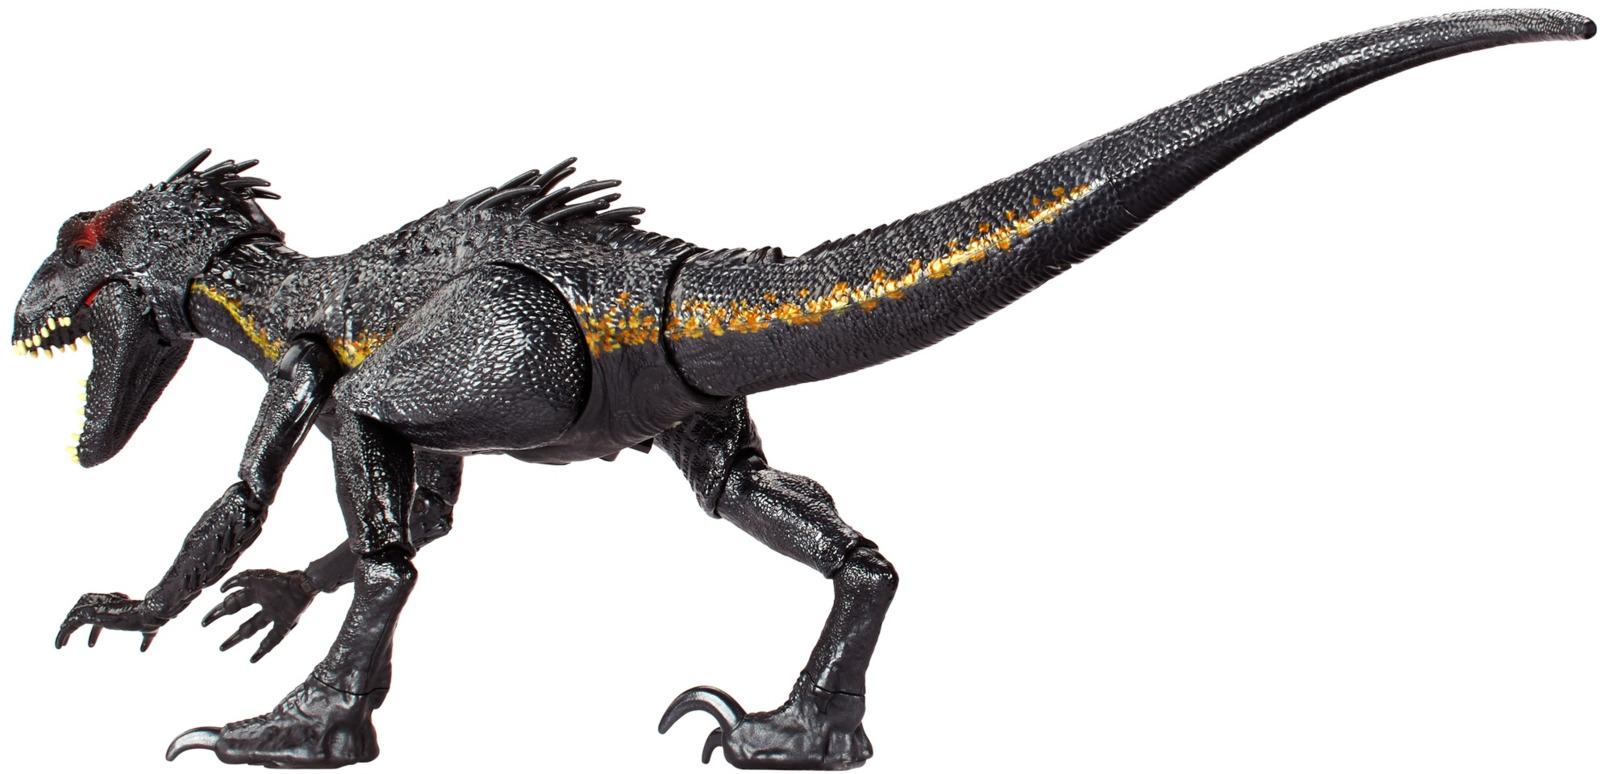 Jurassic World Фигурка функциональная Зловещий Индораптор